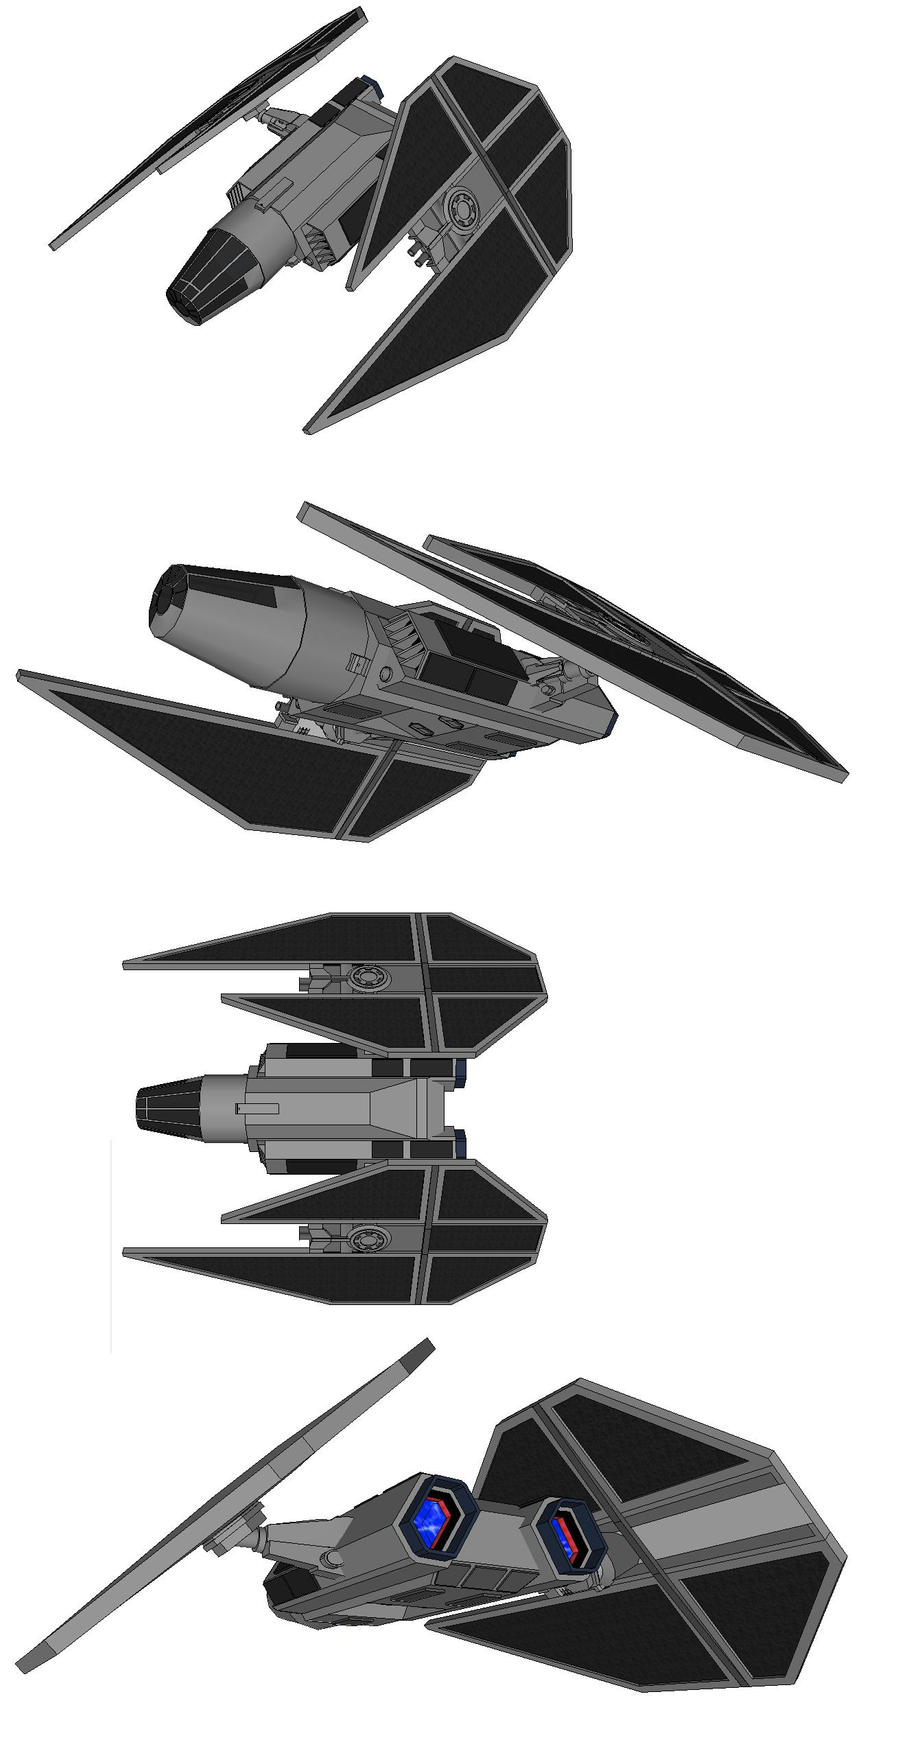 T.I.E. Golem type 1 by FrostLupus